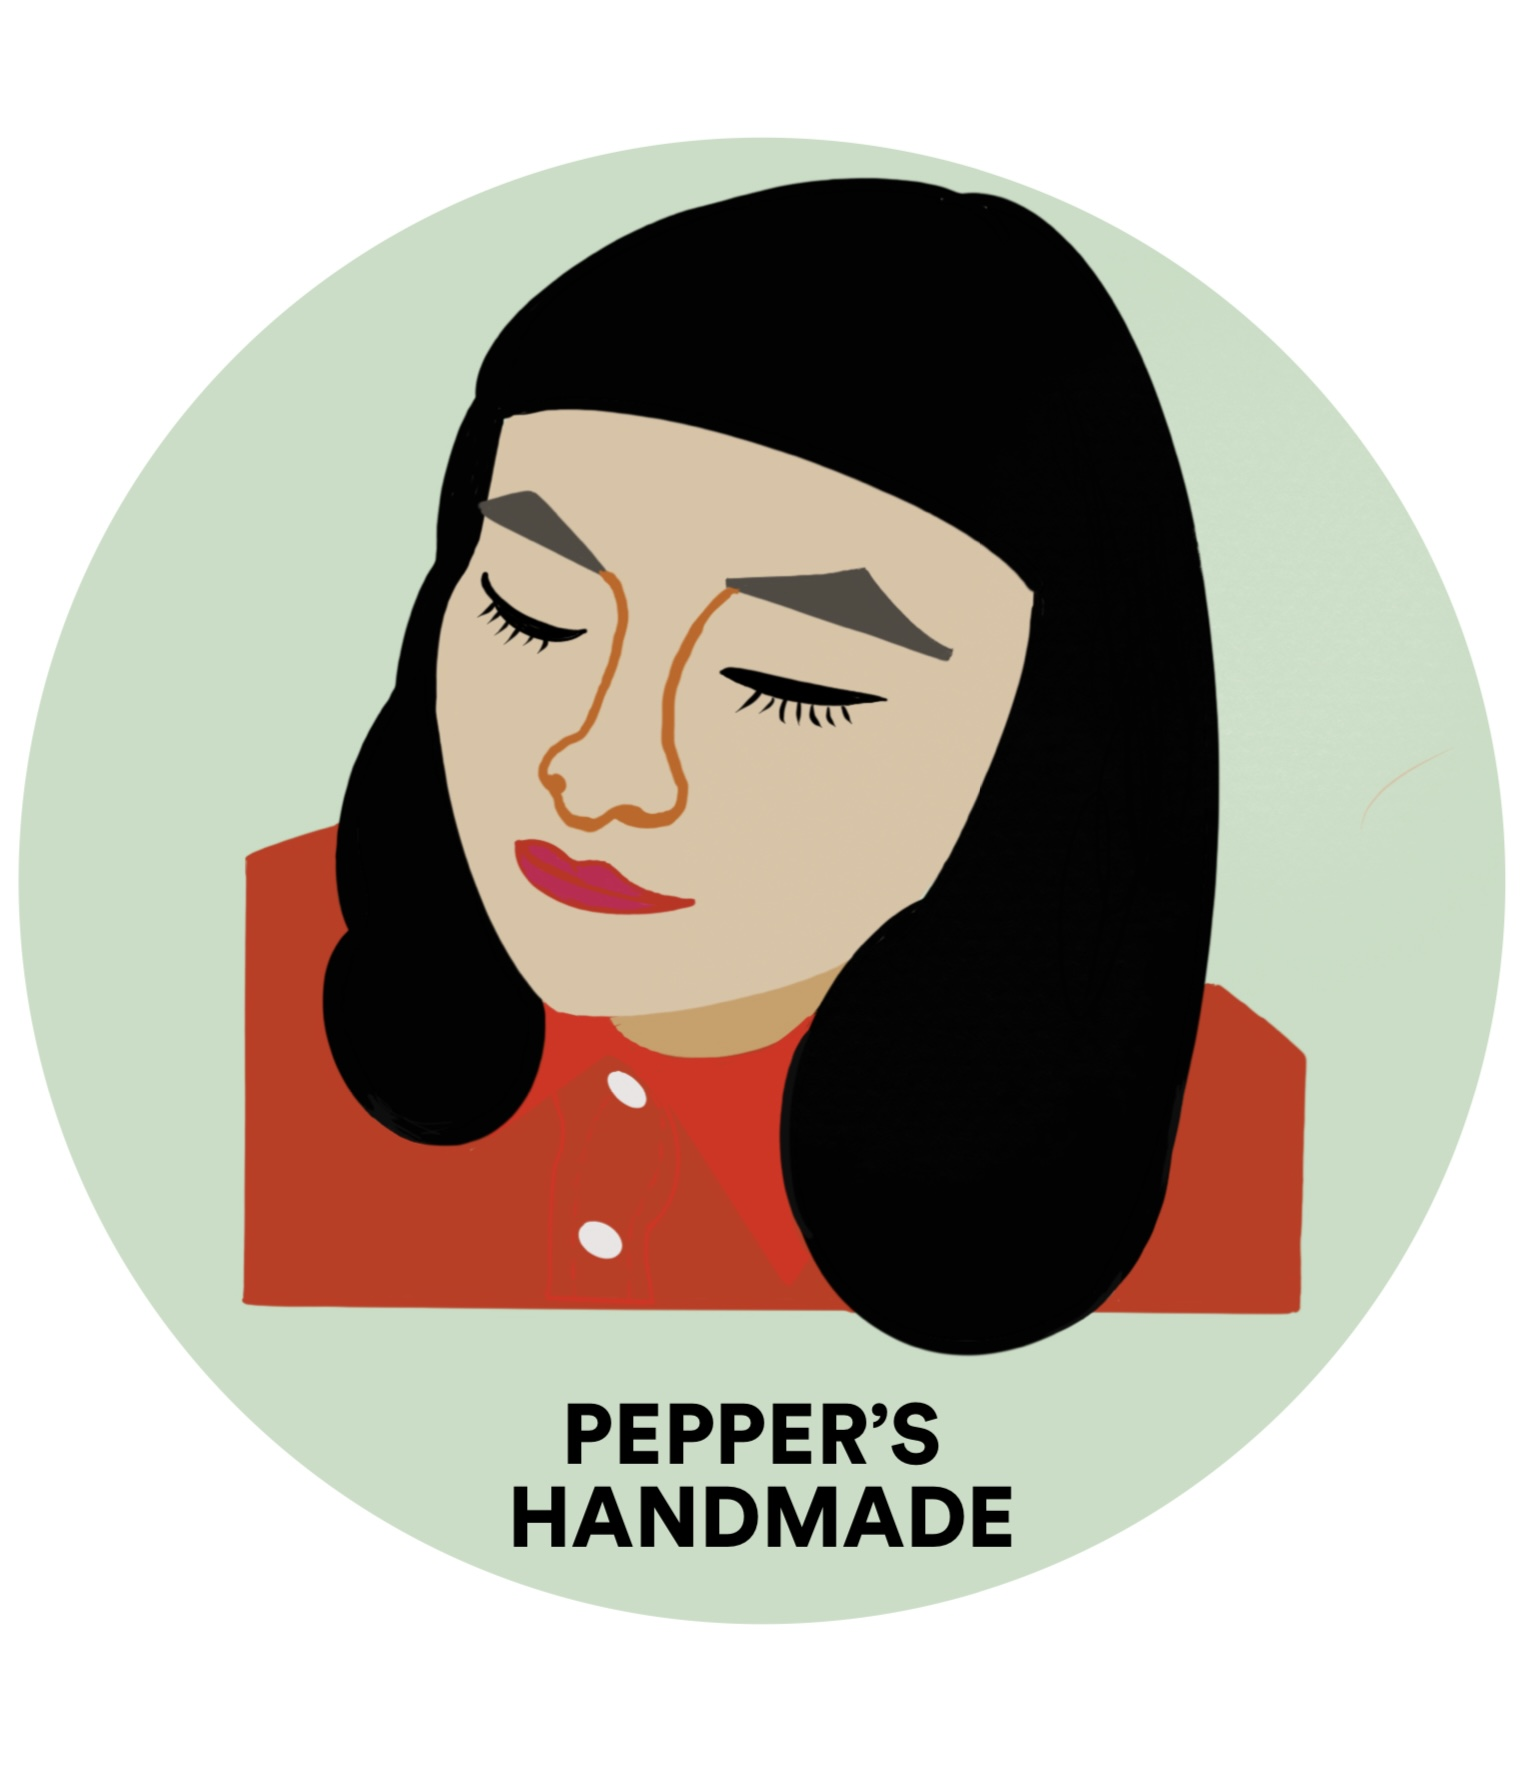 Peppers Handmade